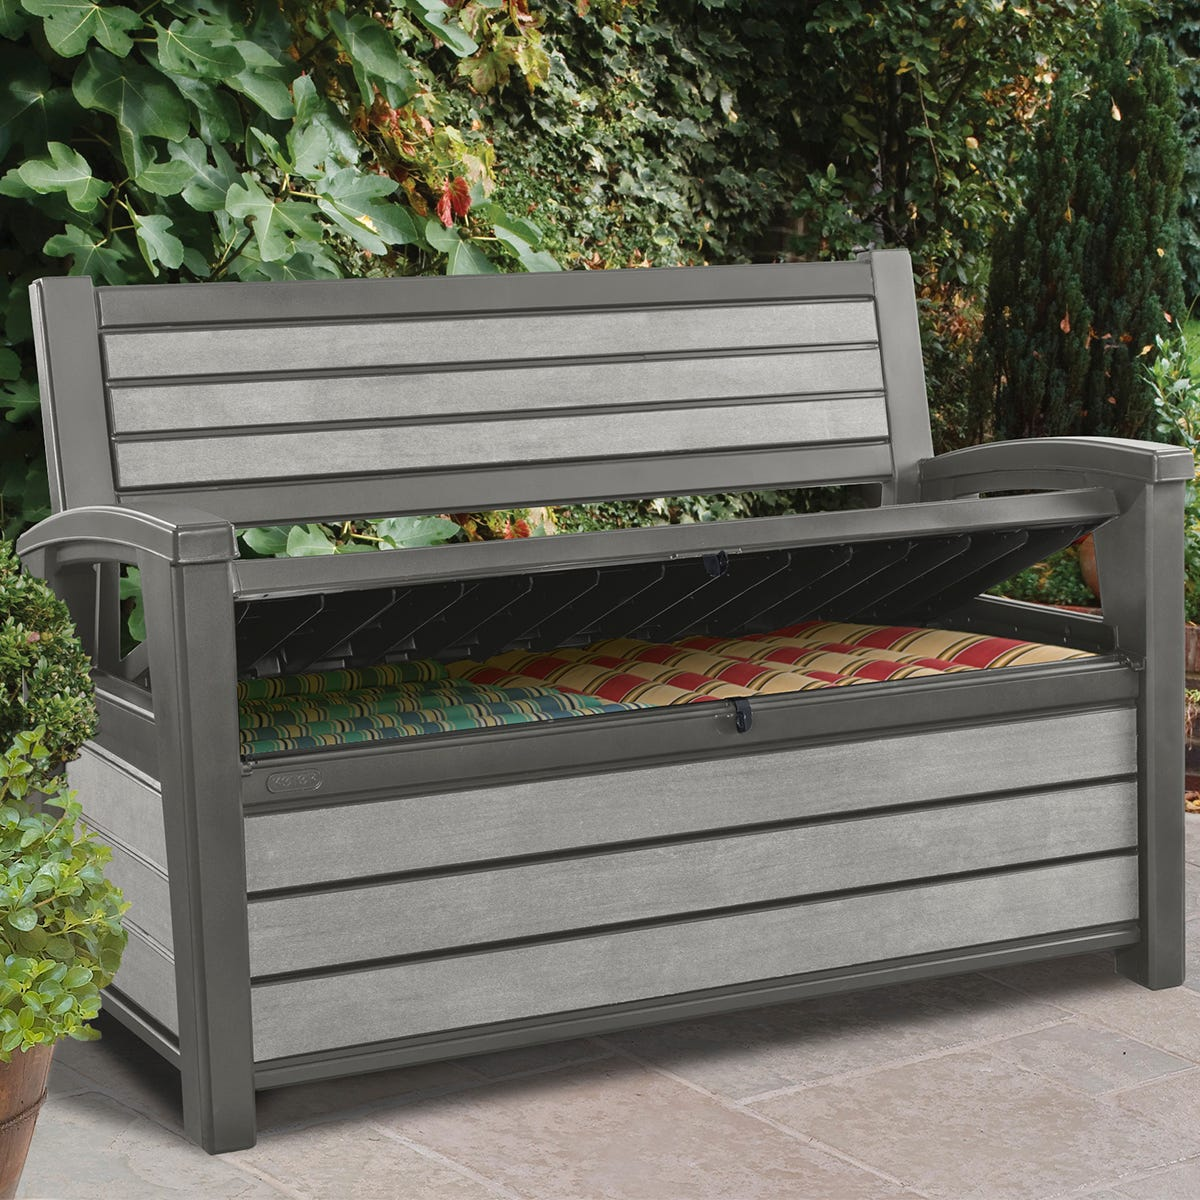 Keter Hudson 227L Storage Bench - Grey